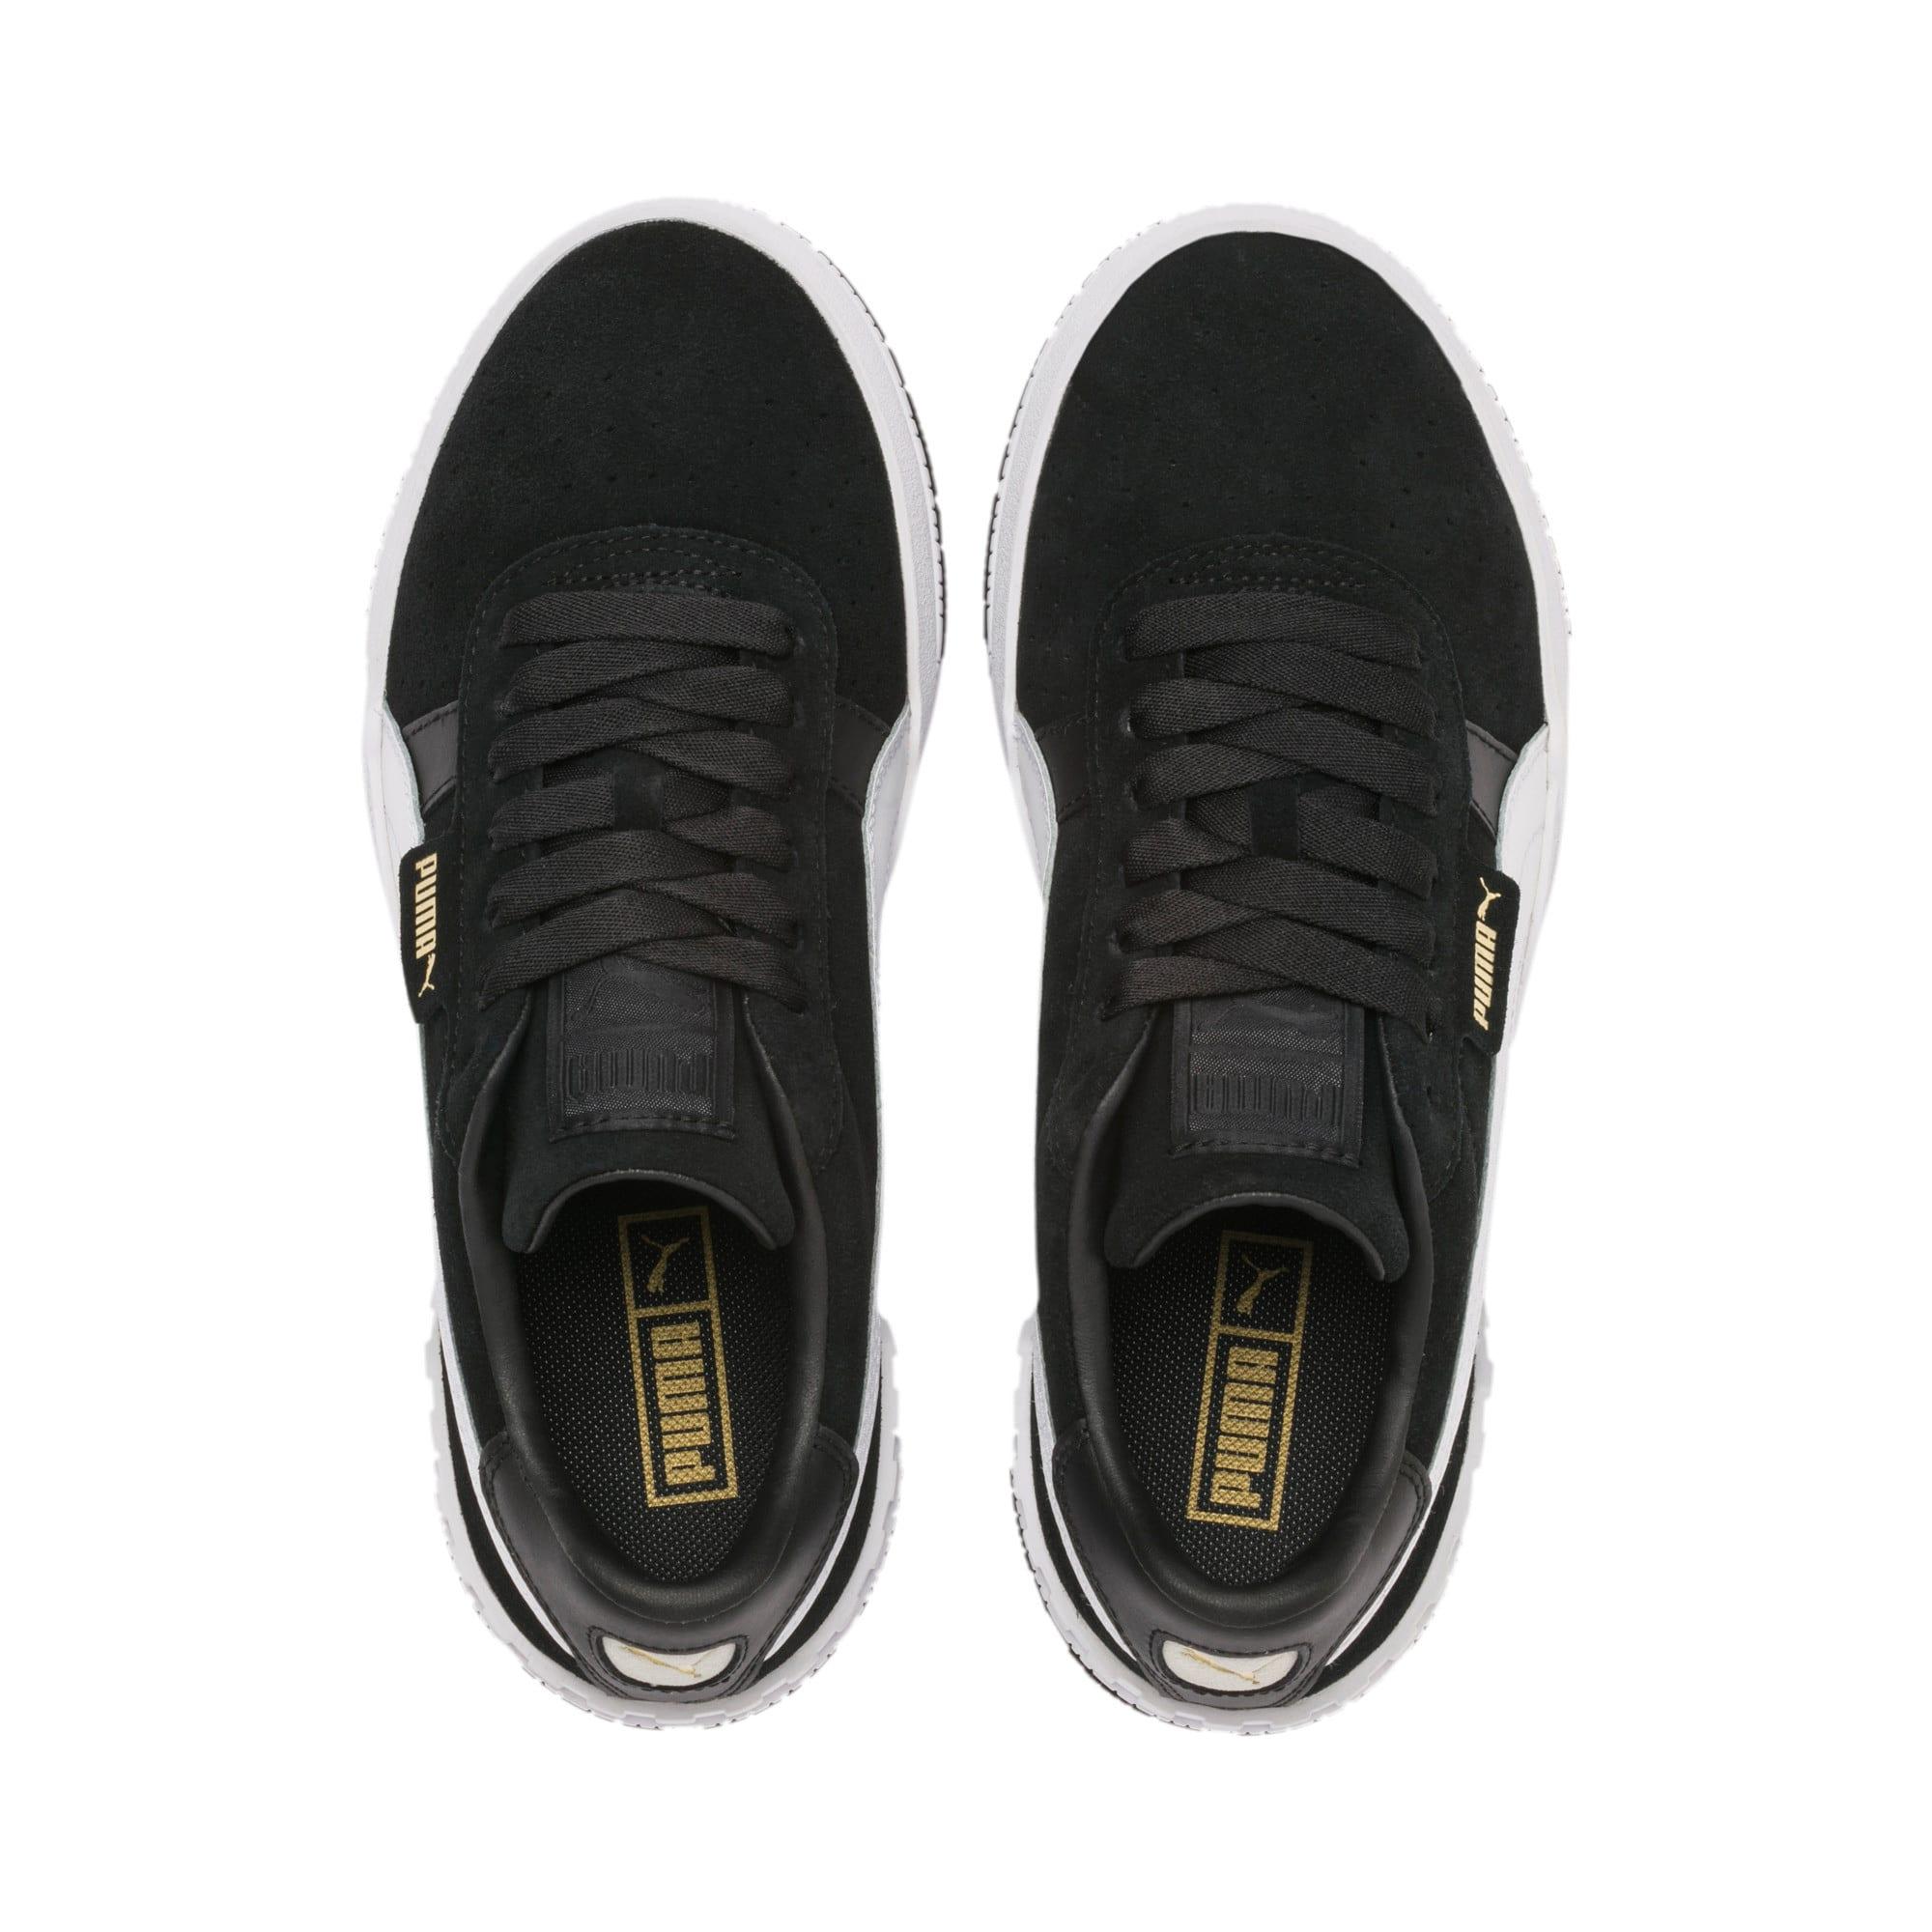 Thumbnail 7 of Cali Taped Damen Sneaker, Puma Black-Metallic Gold, medium